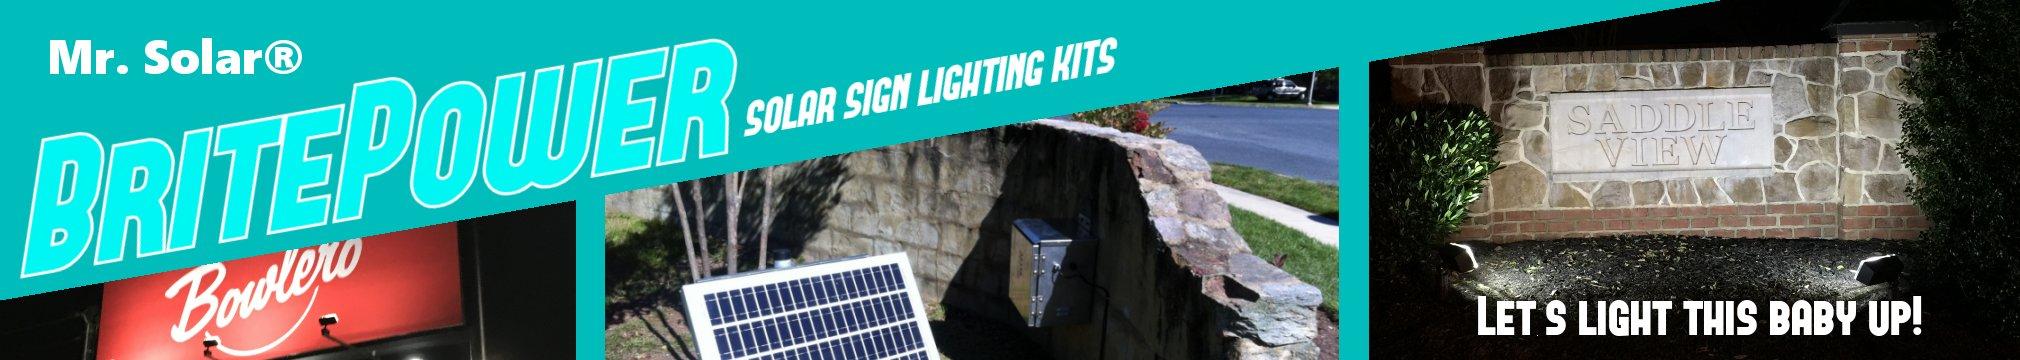 Mr. Solar® is your B2B Solar Sign Lighting Headquarters!